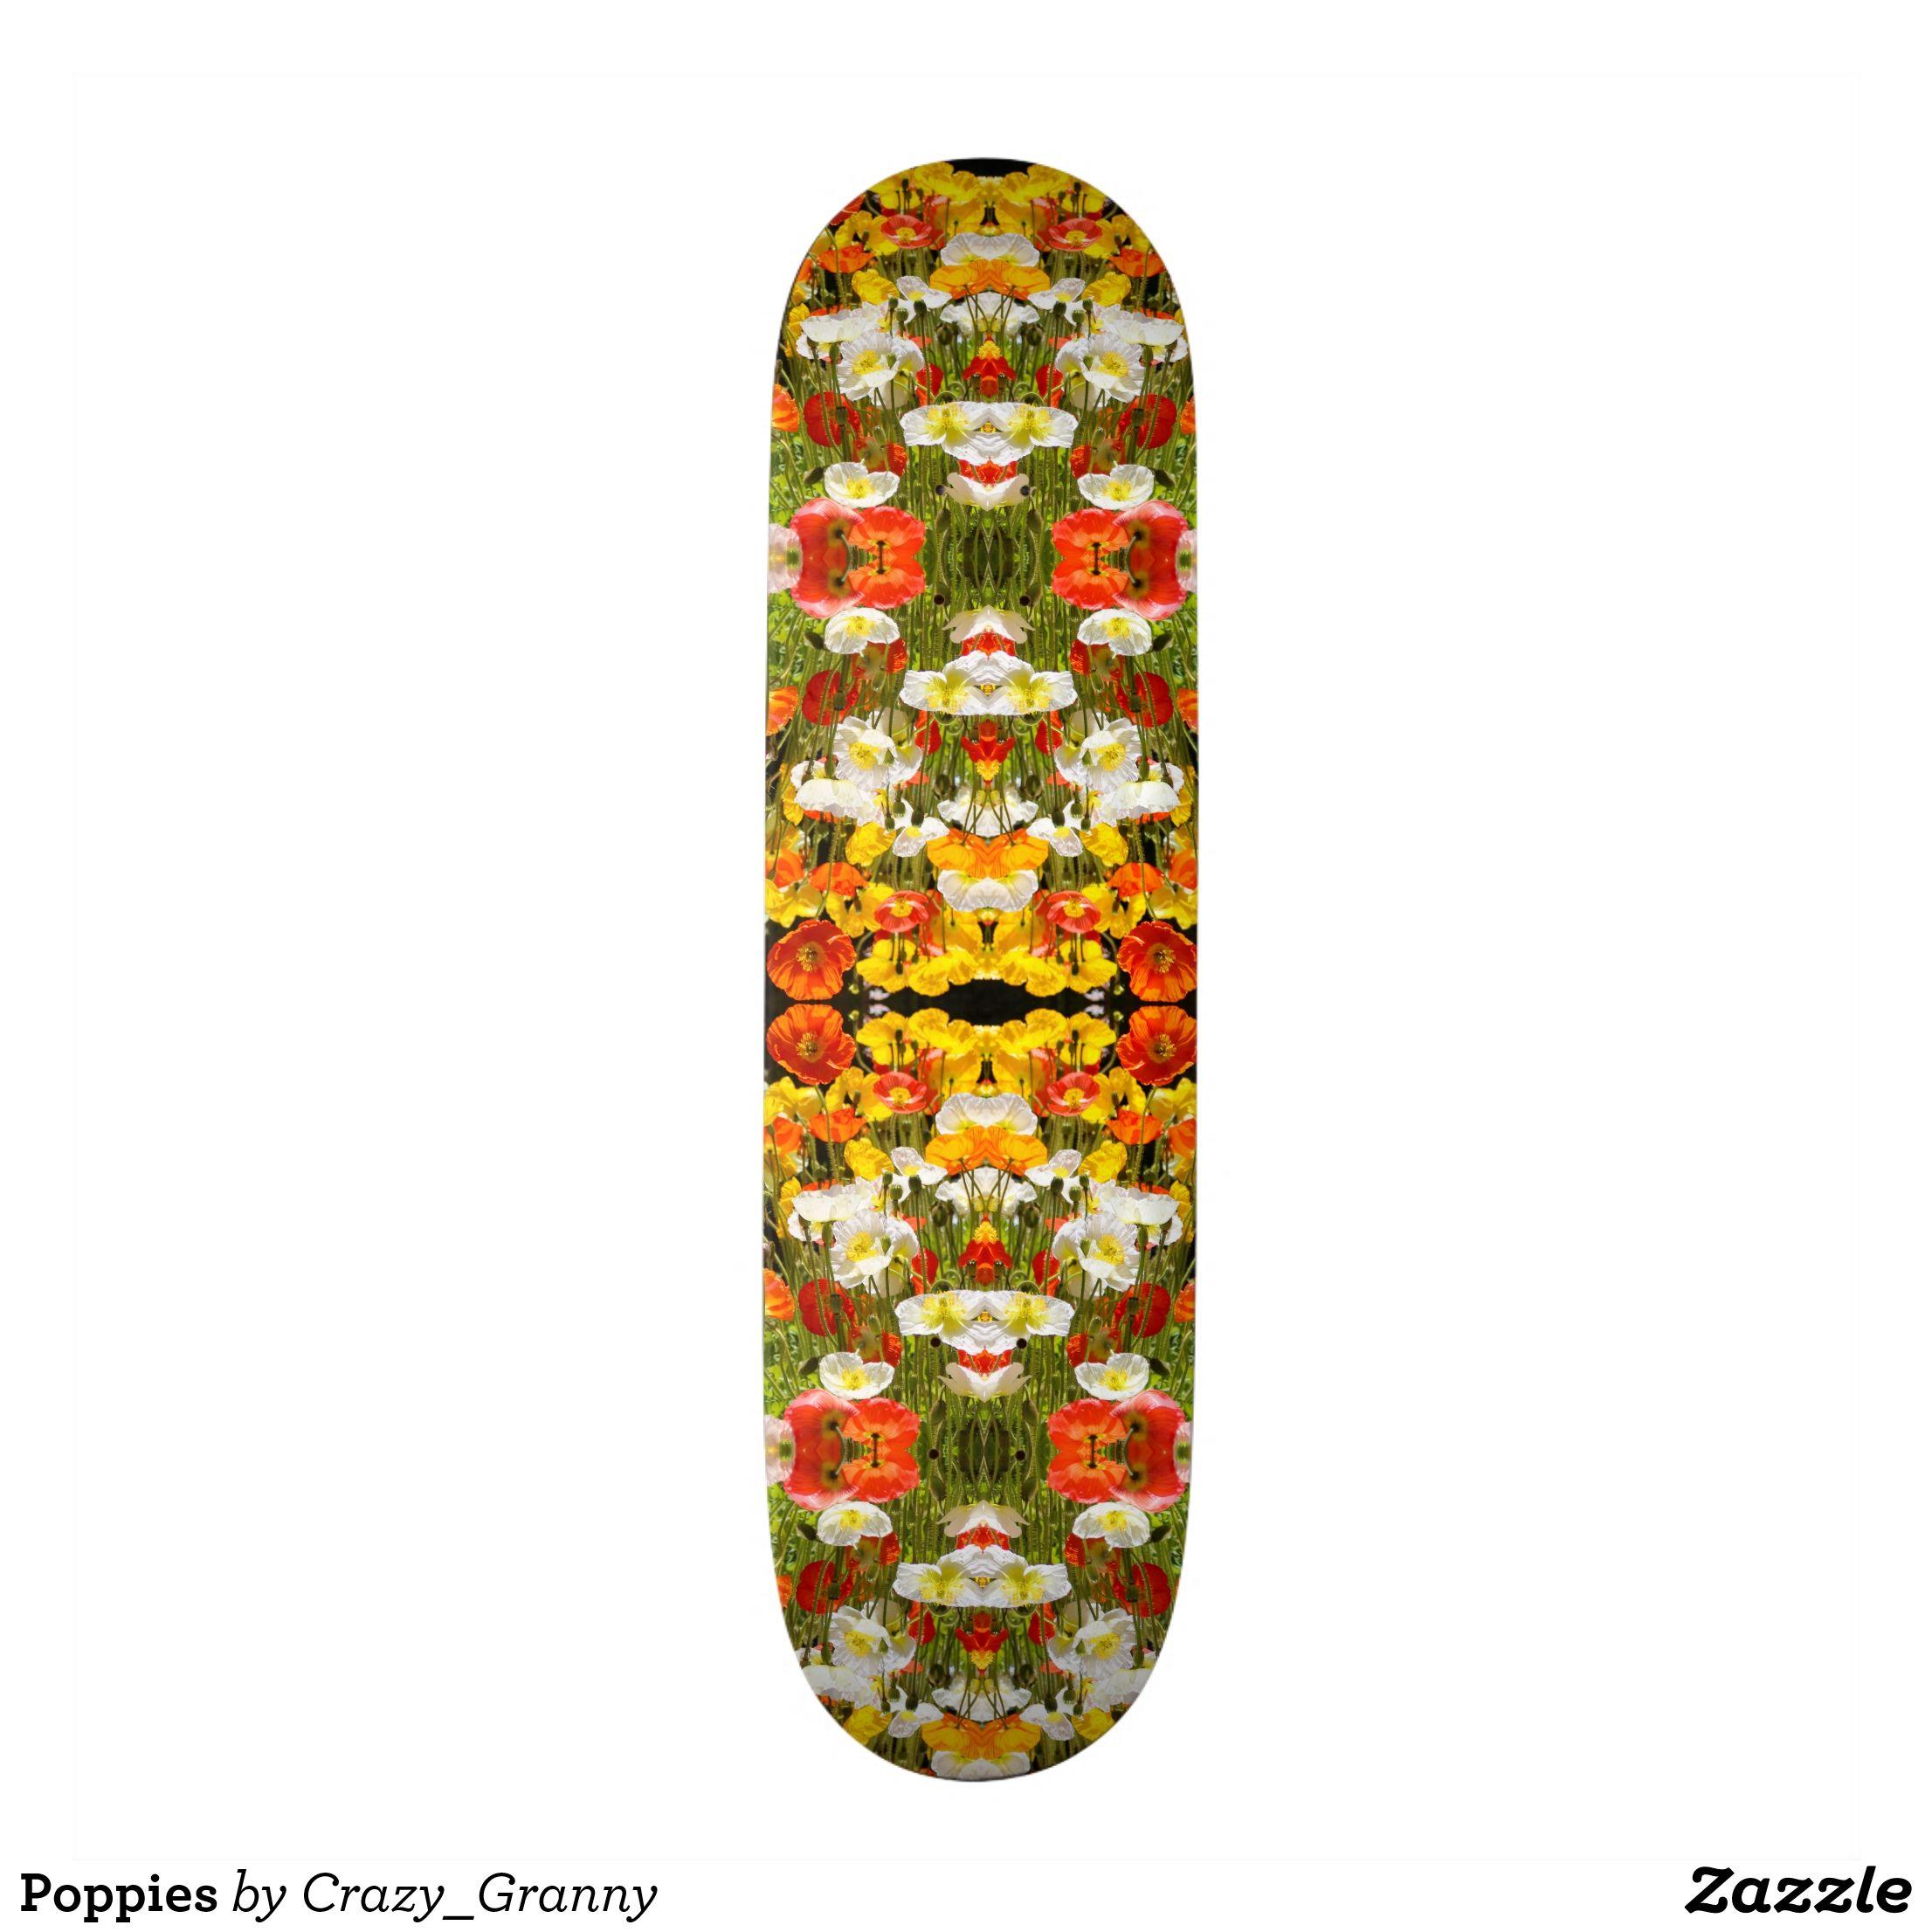 Poppies Skateboard Zazzle Com Poppies Skateboard Fashion Graphic